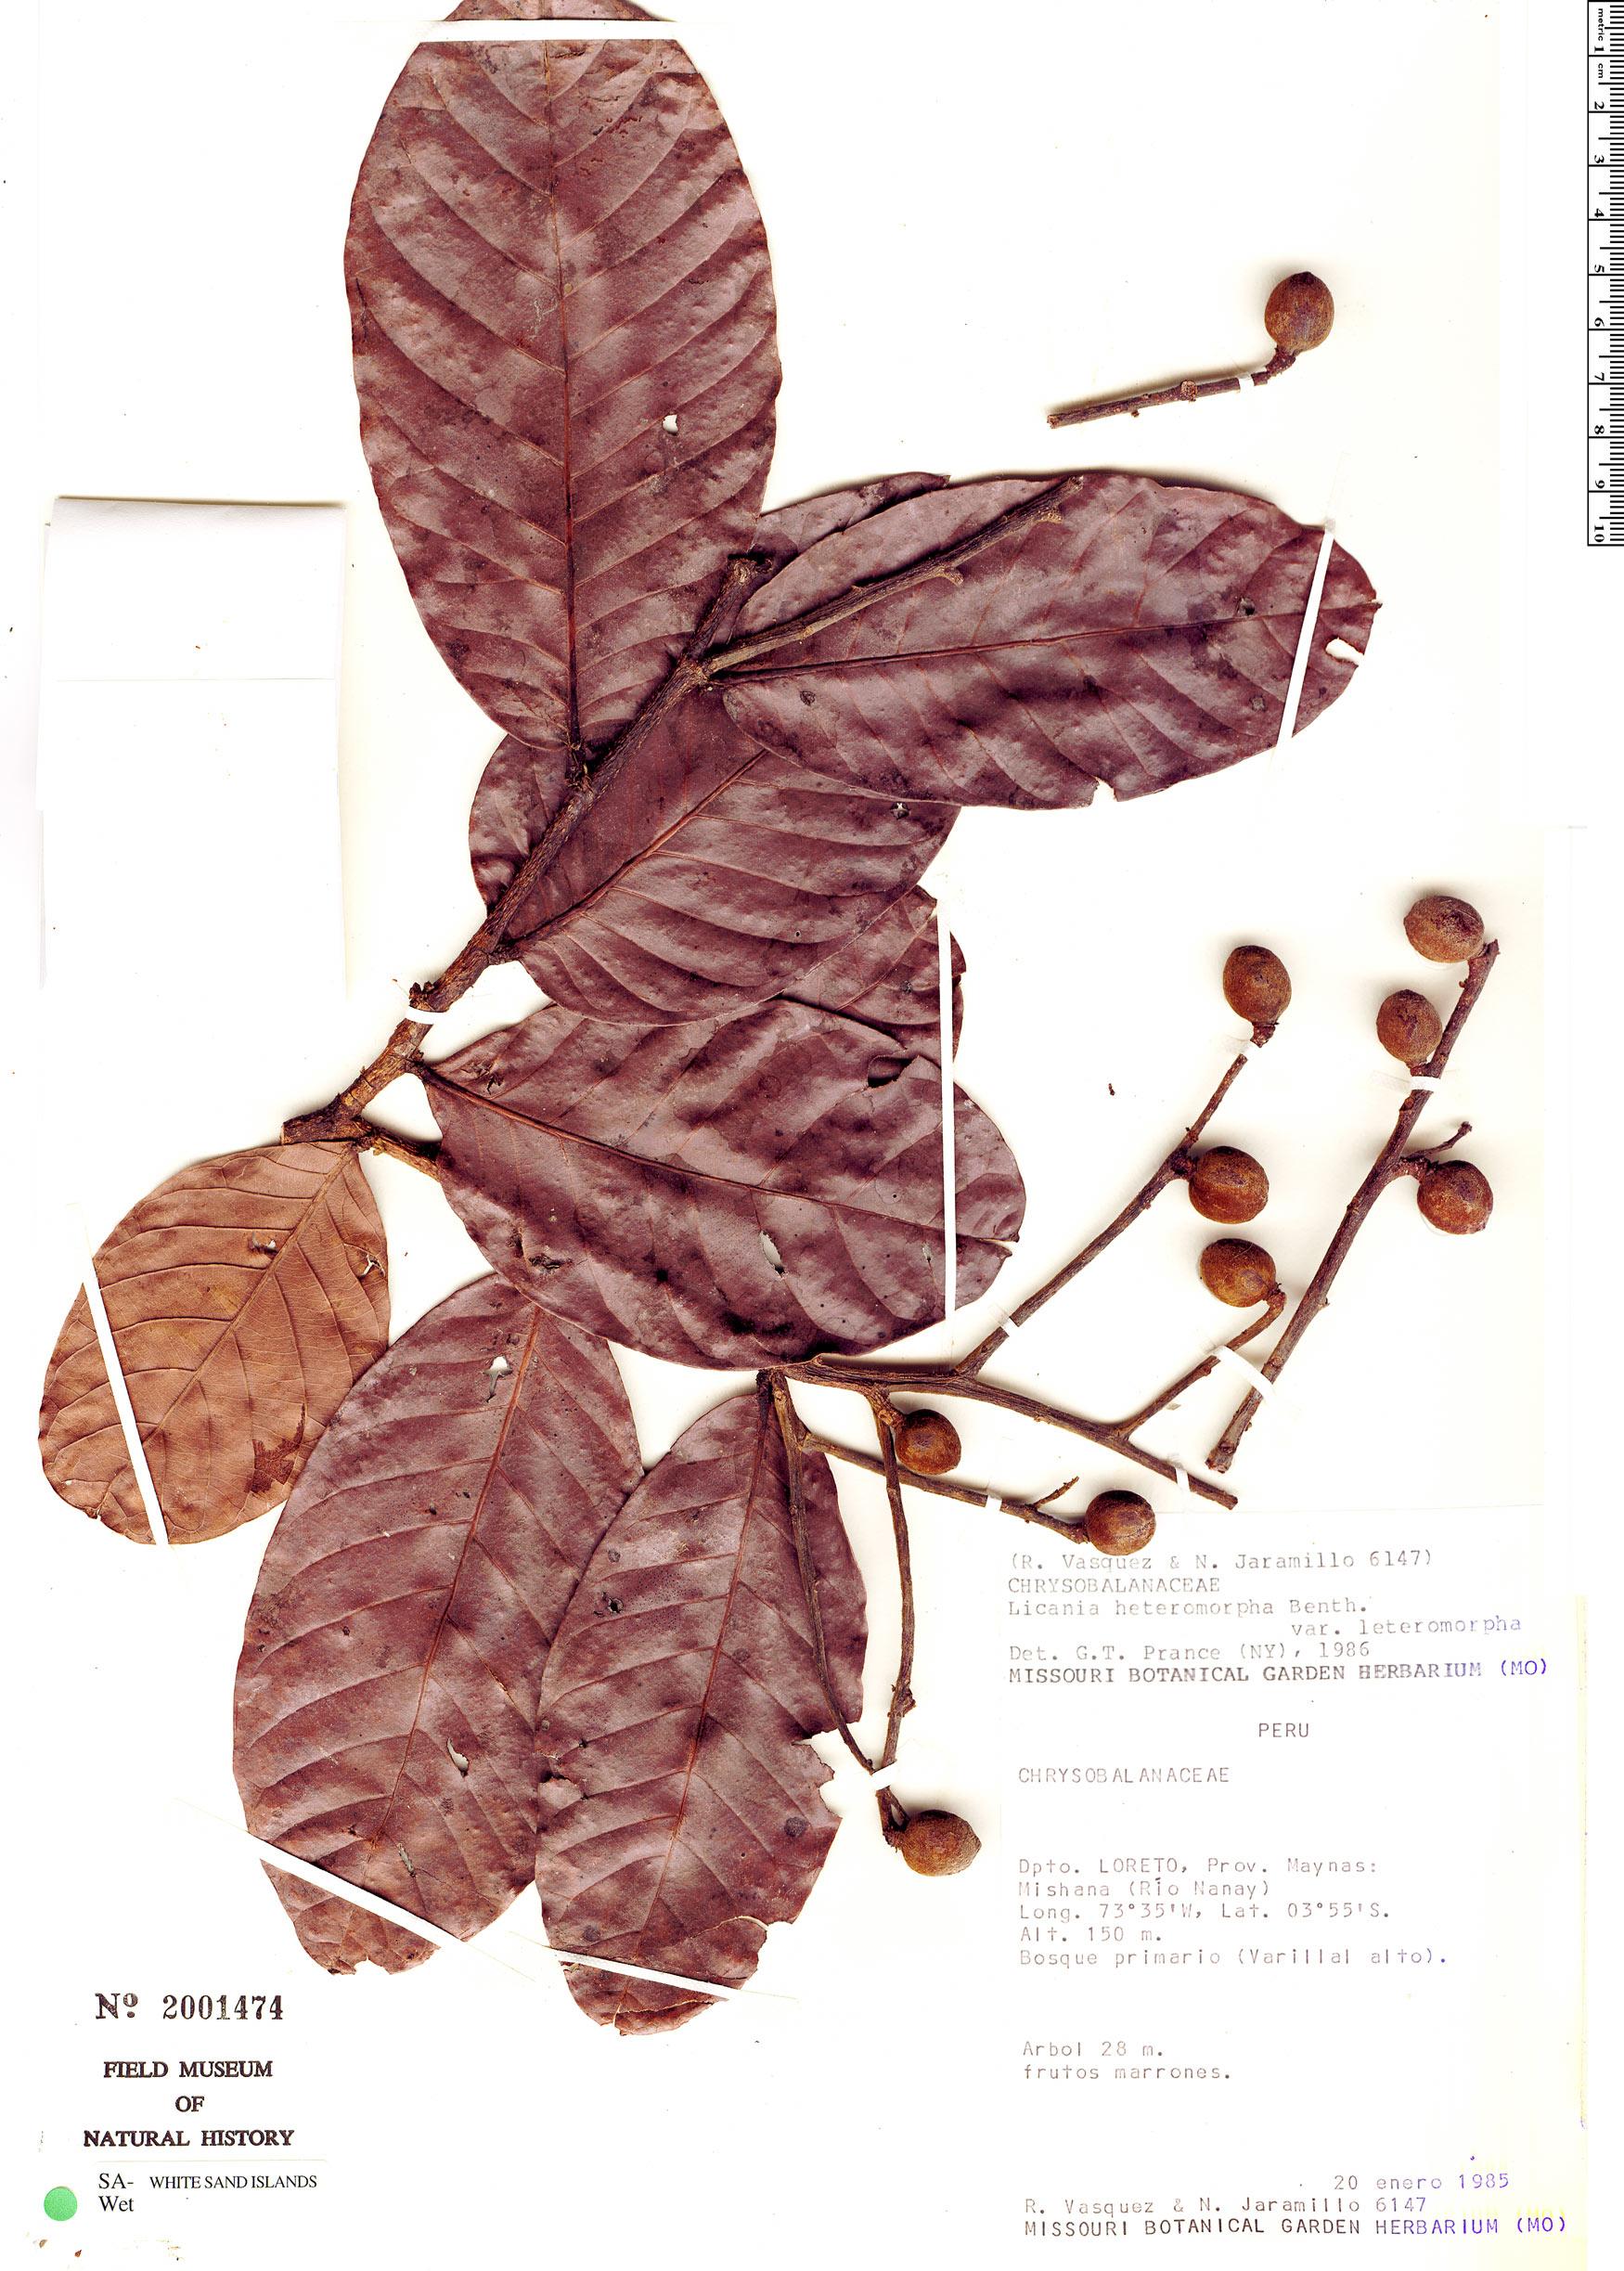 Specimen: Licania heteromorpha